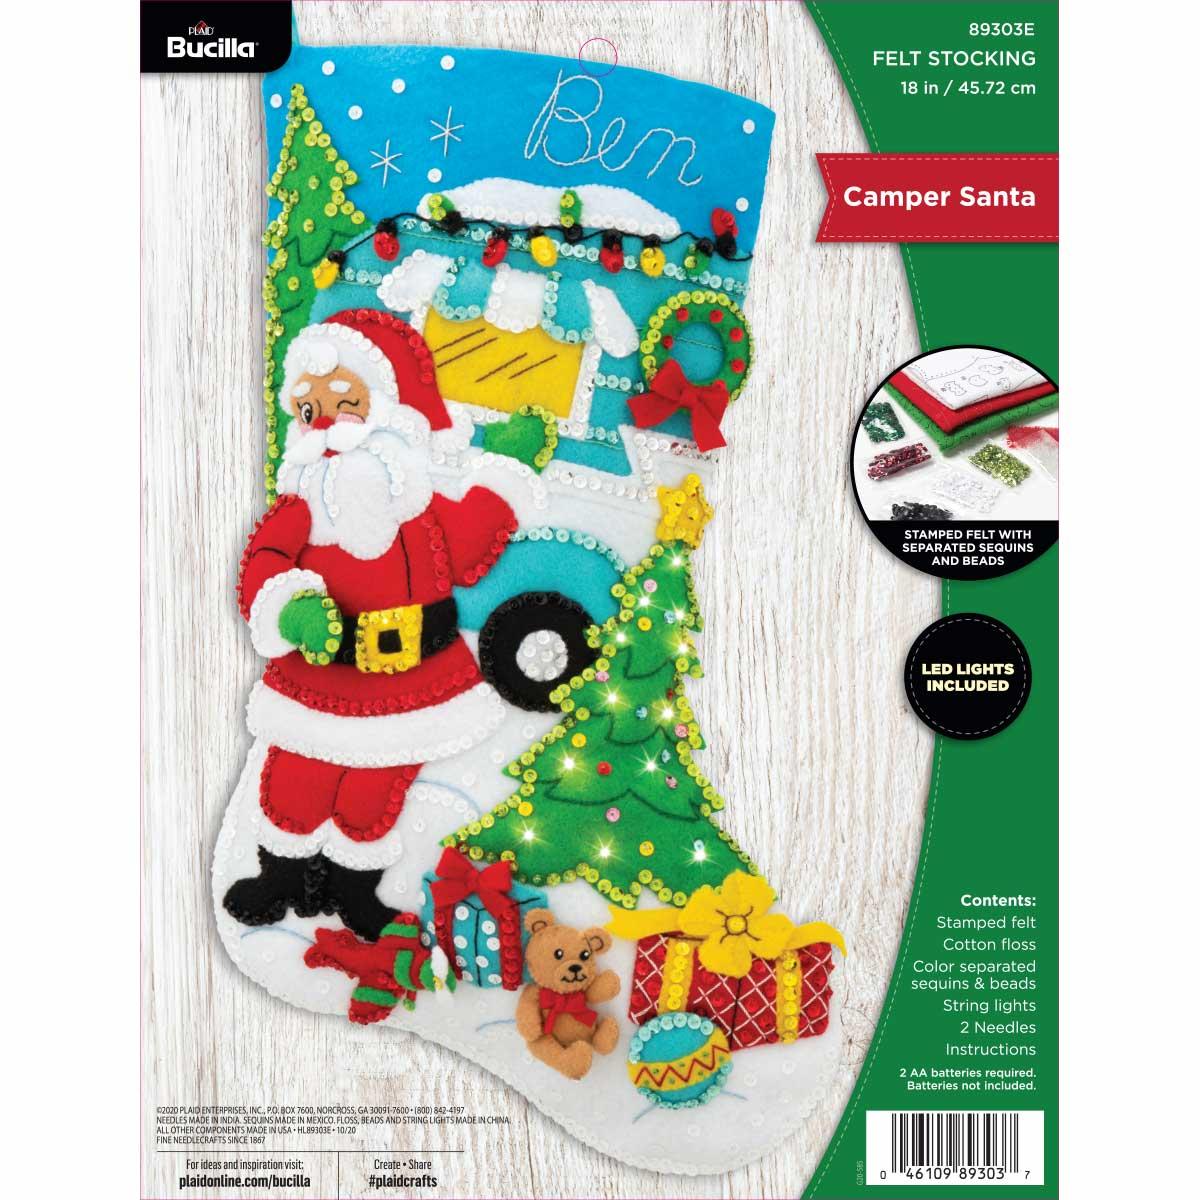 Bucilla ® Seasonal - Felt - Stocking Kits - Camper Santa with String Lights - 89303E